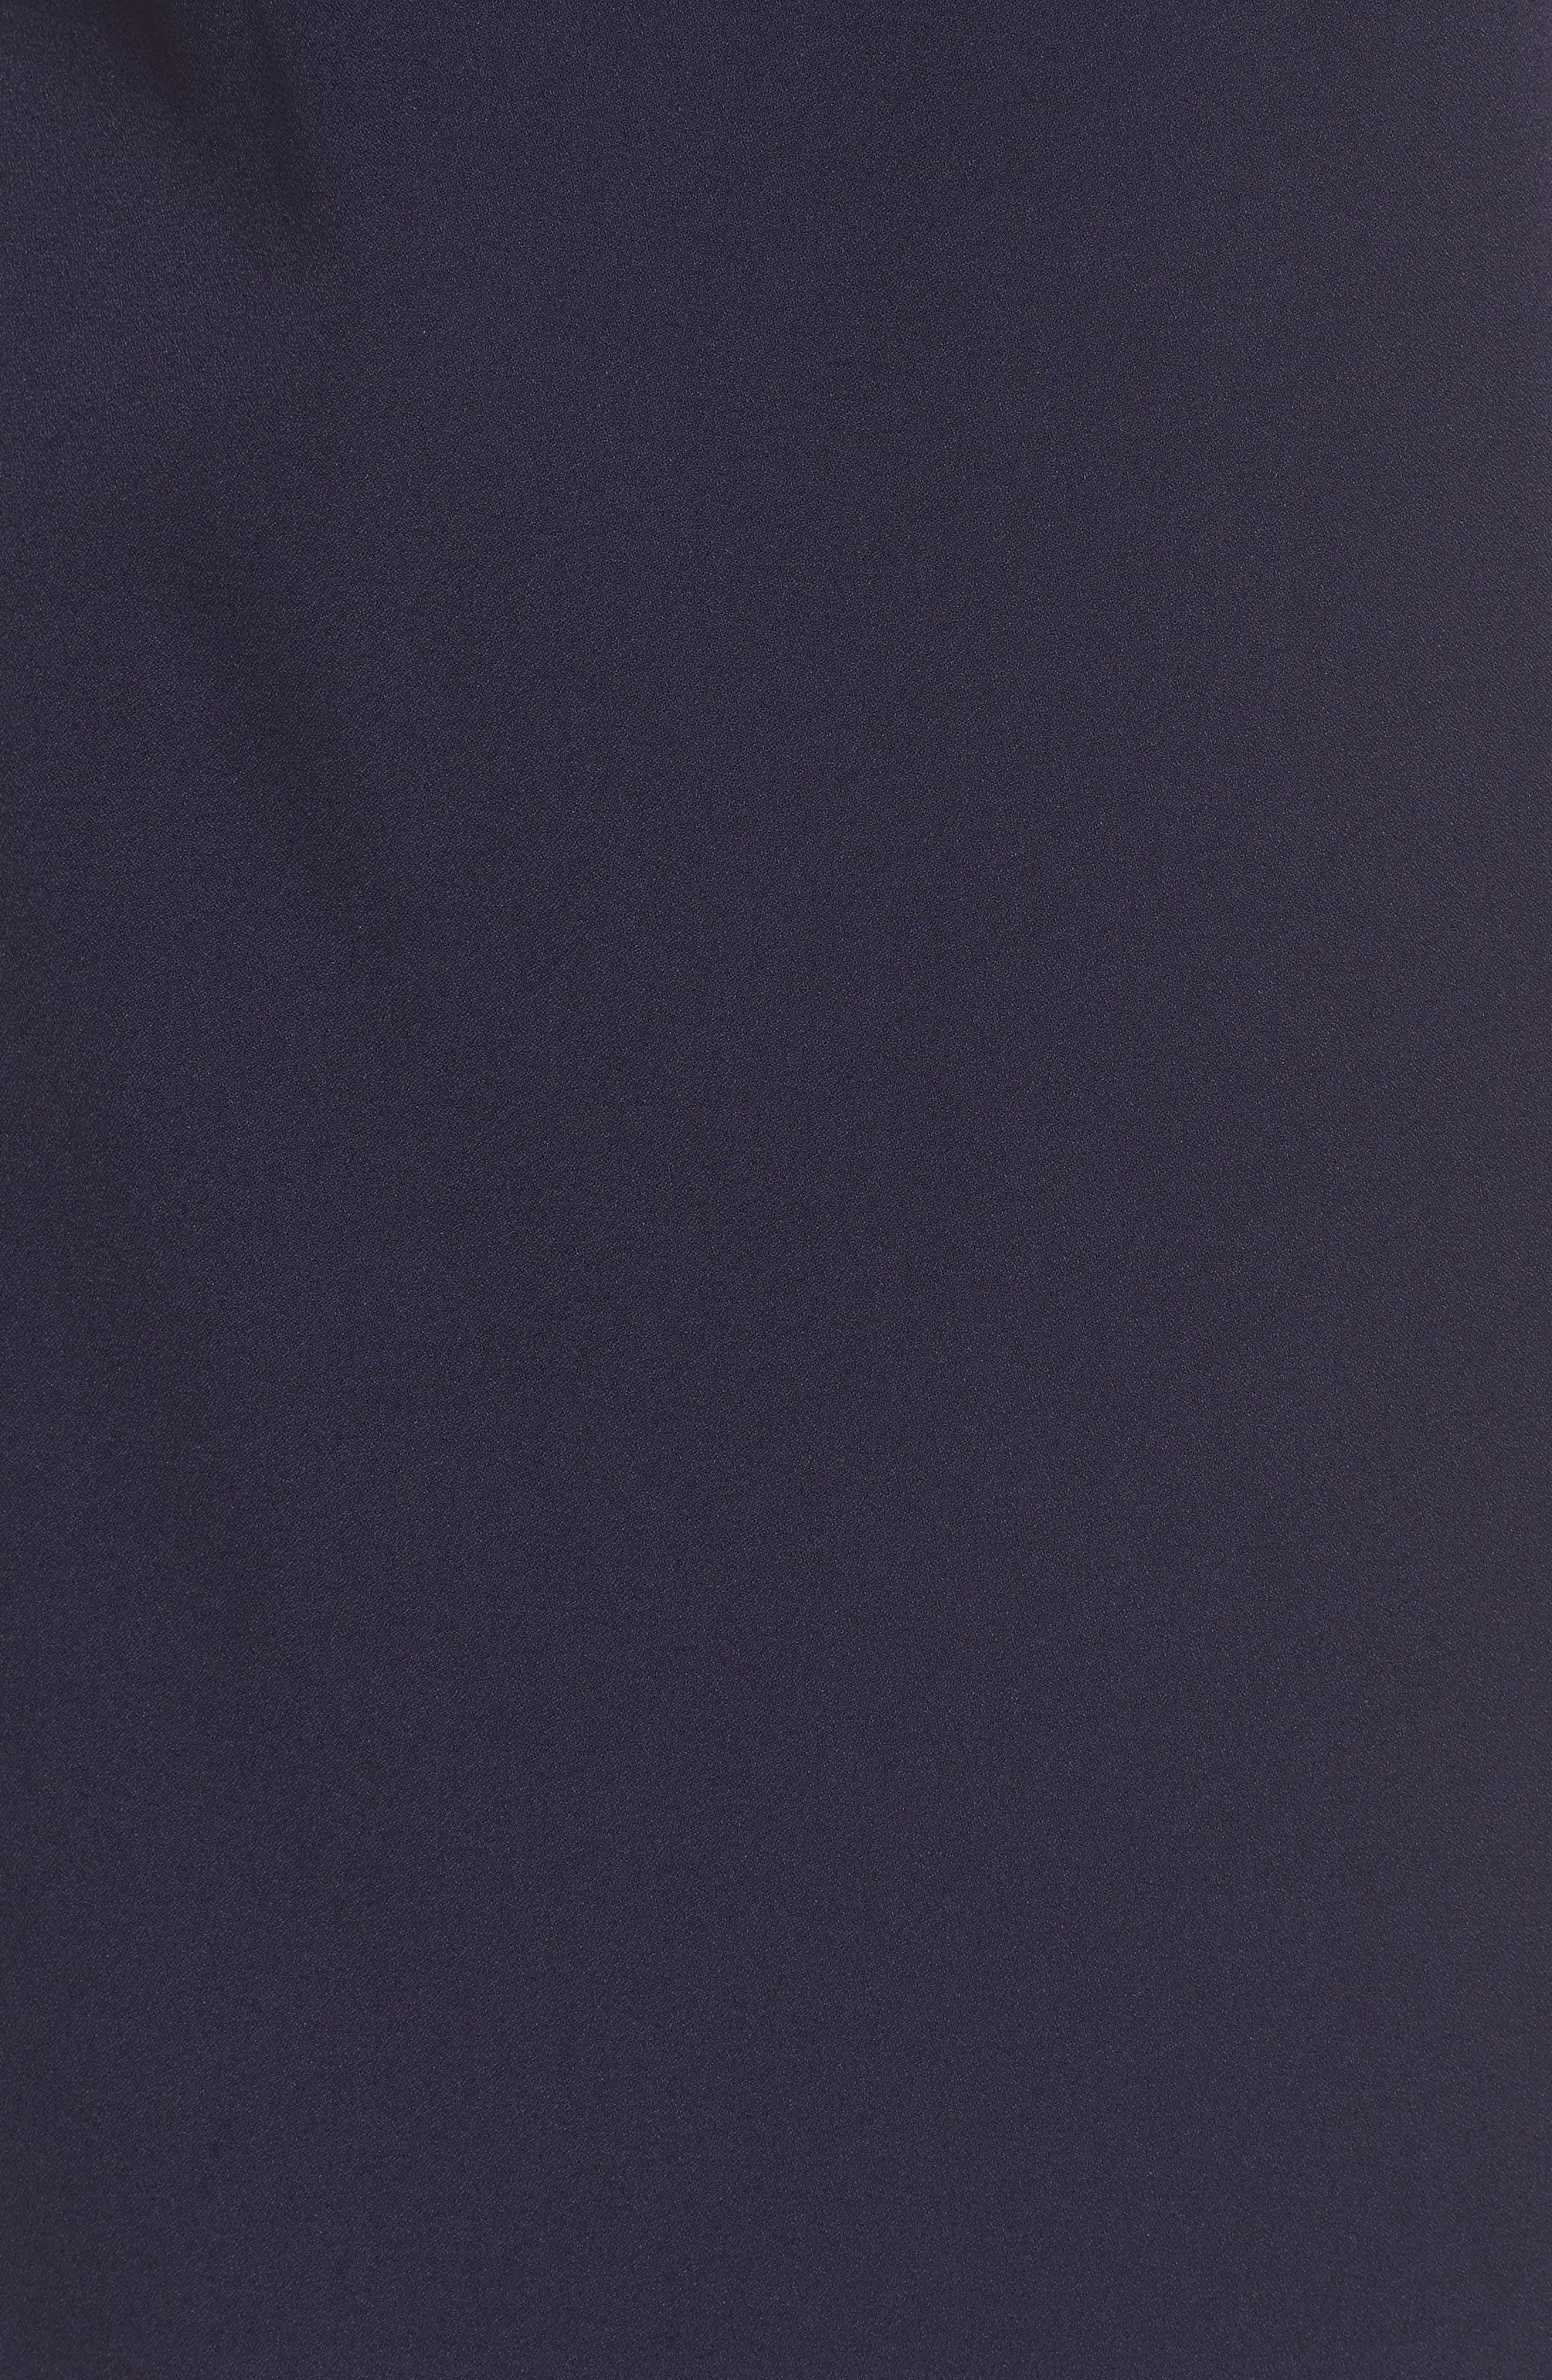 Puff Sleeve Shift Dress,                             Alternate thumbnail 6, color,                             410